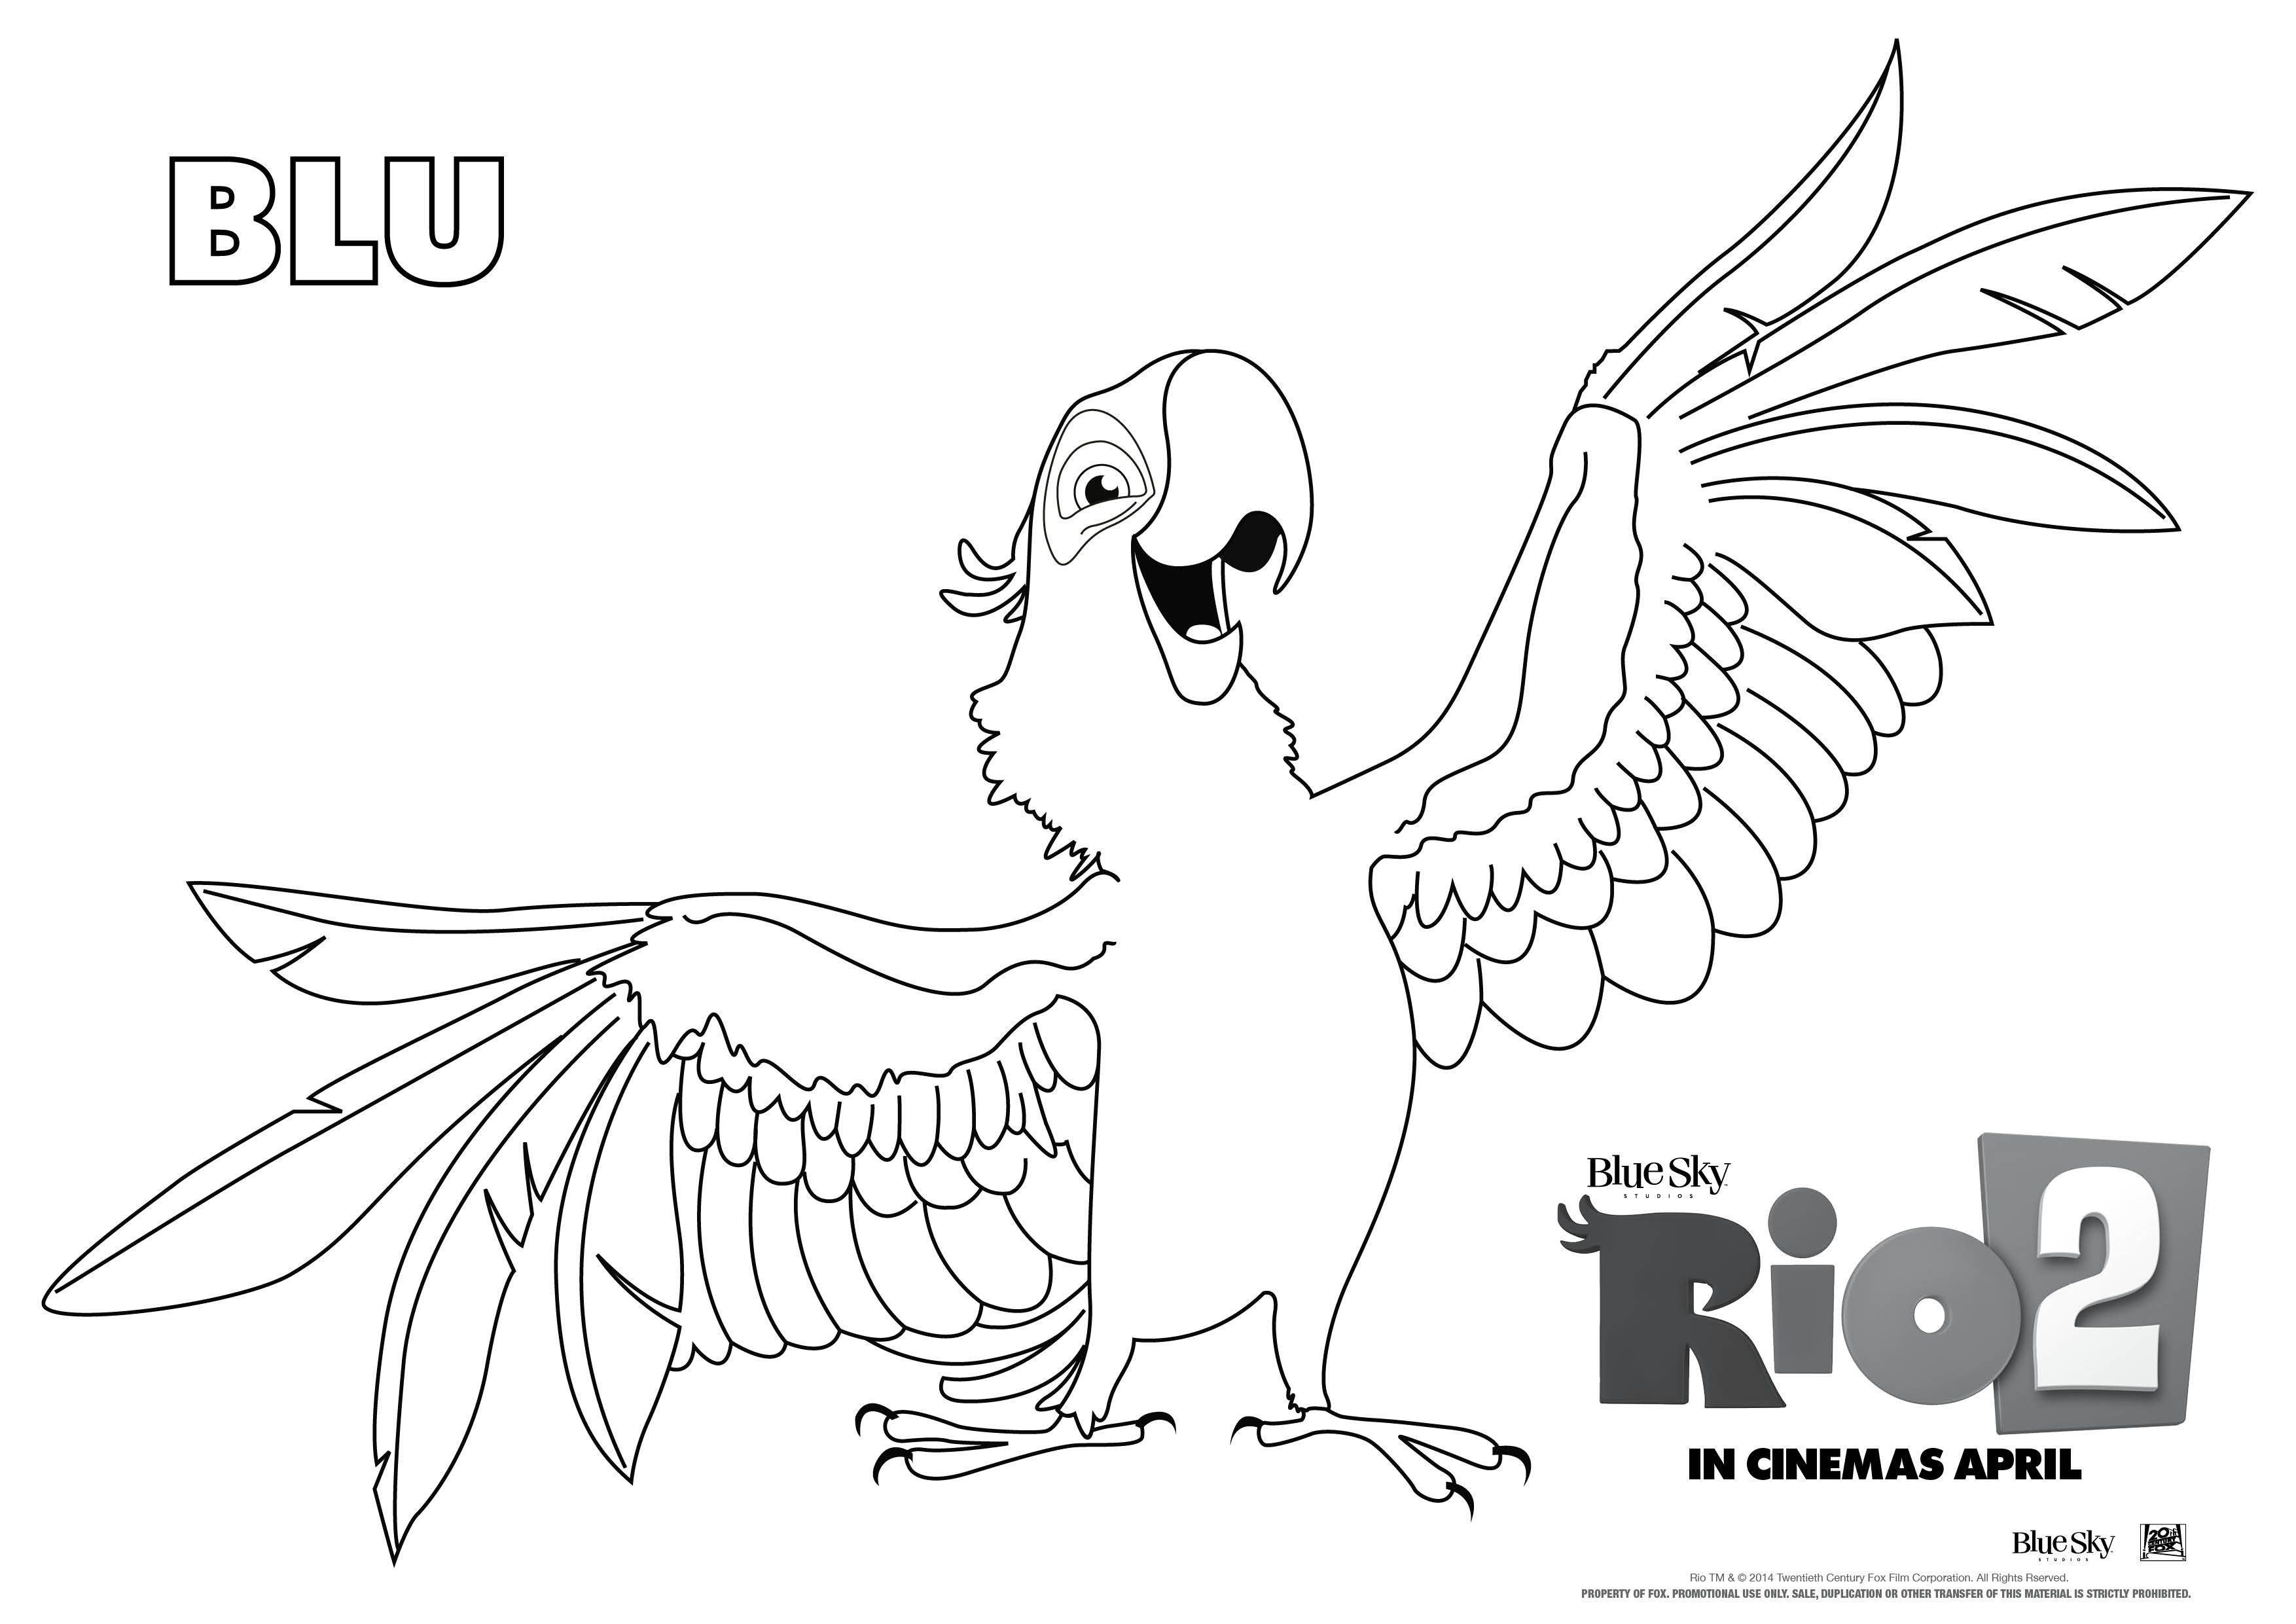 Rio 2 Coloring Pages Filme Rio Coisas Para Desenhar Atividades Para Colorir